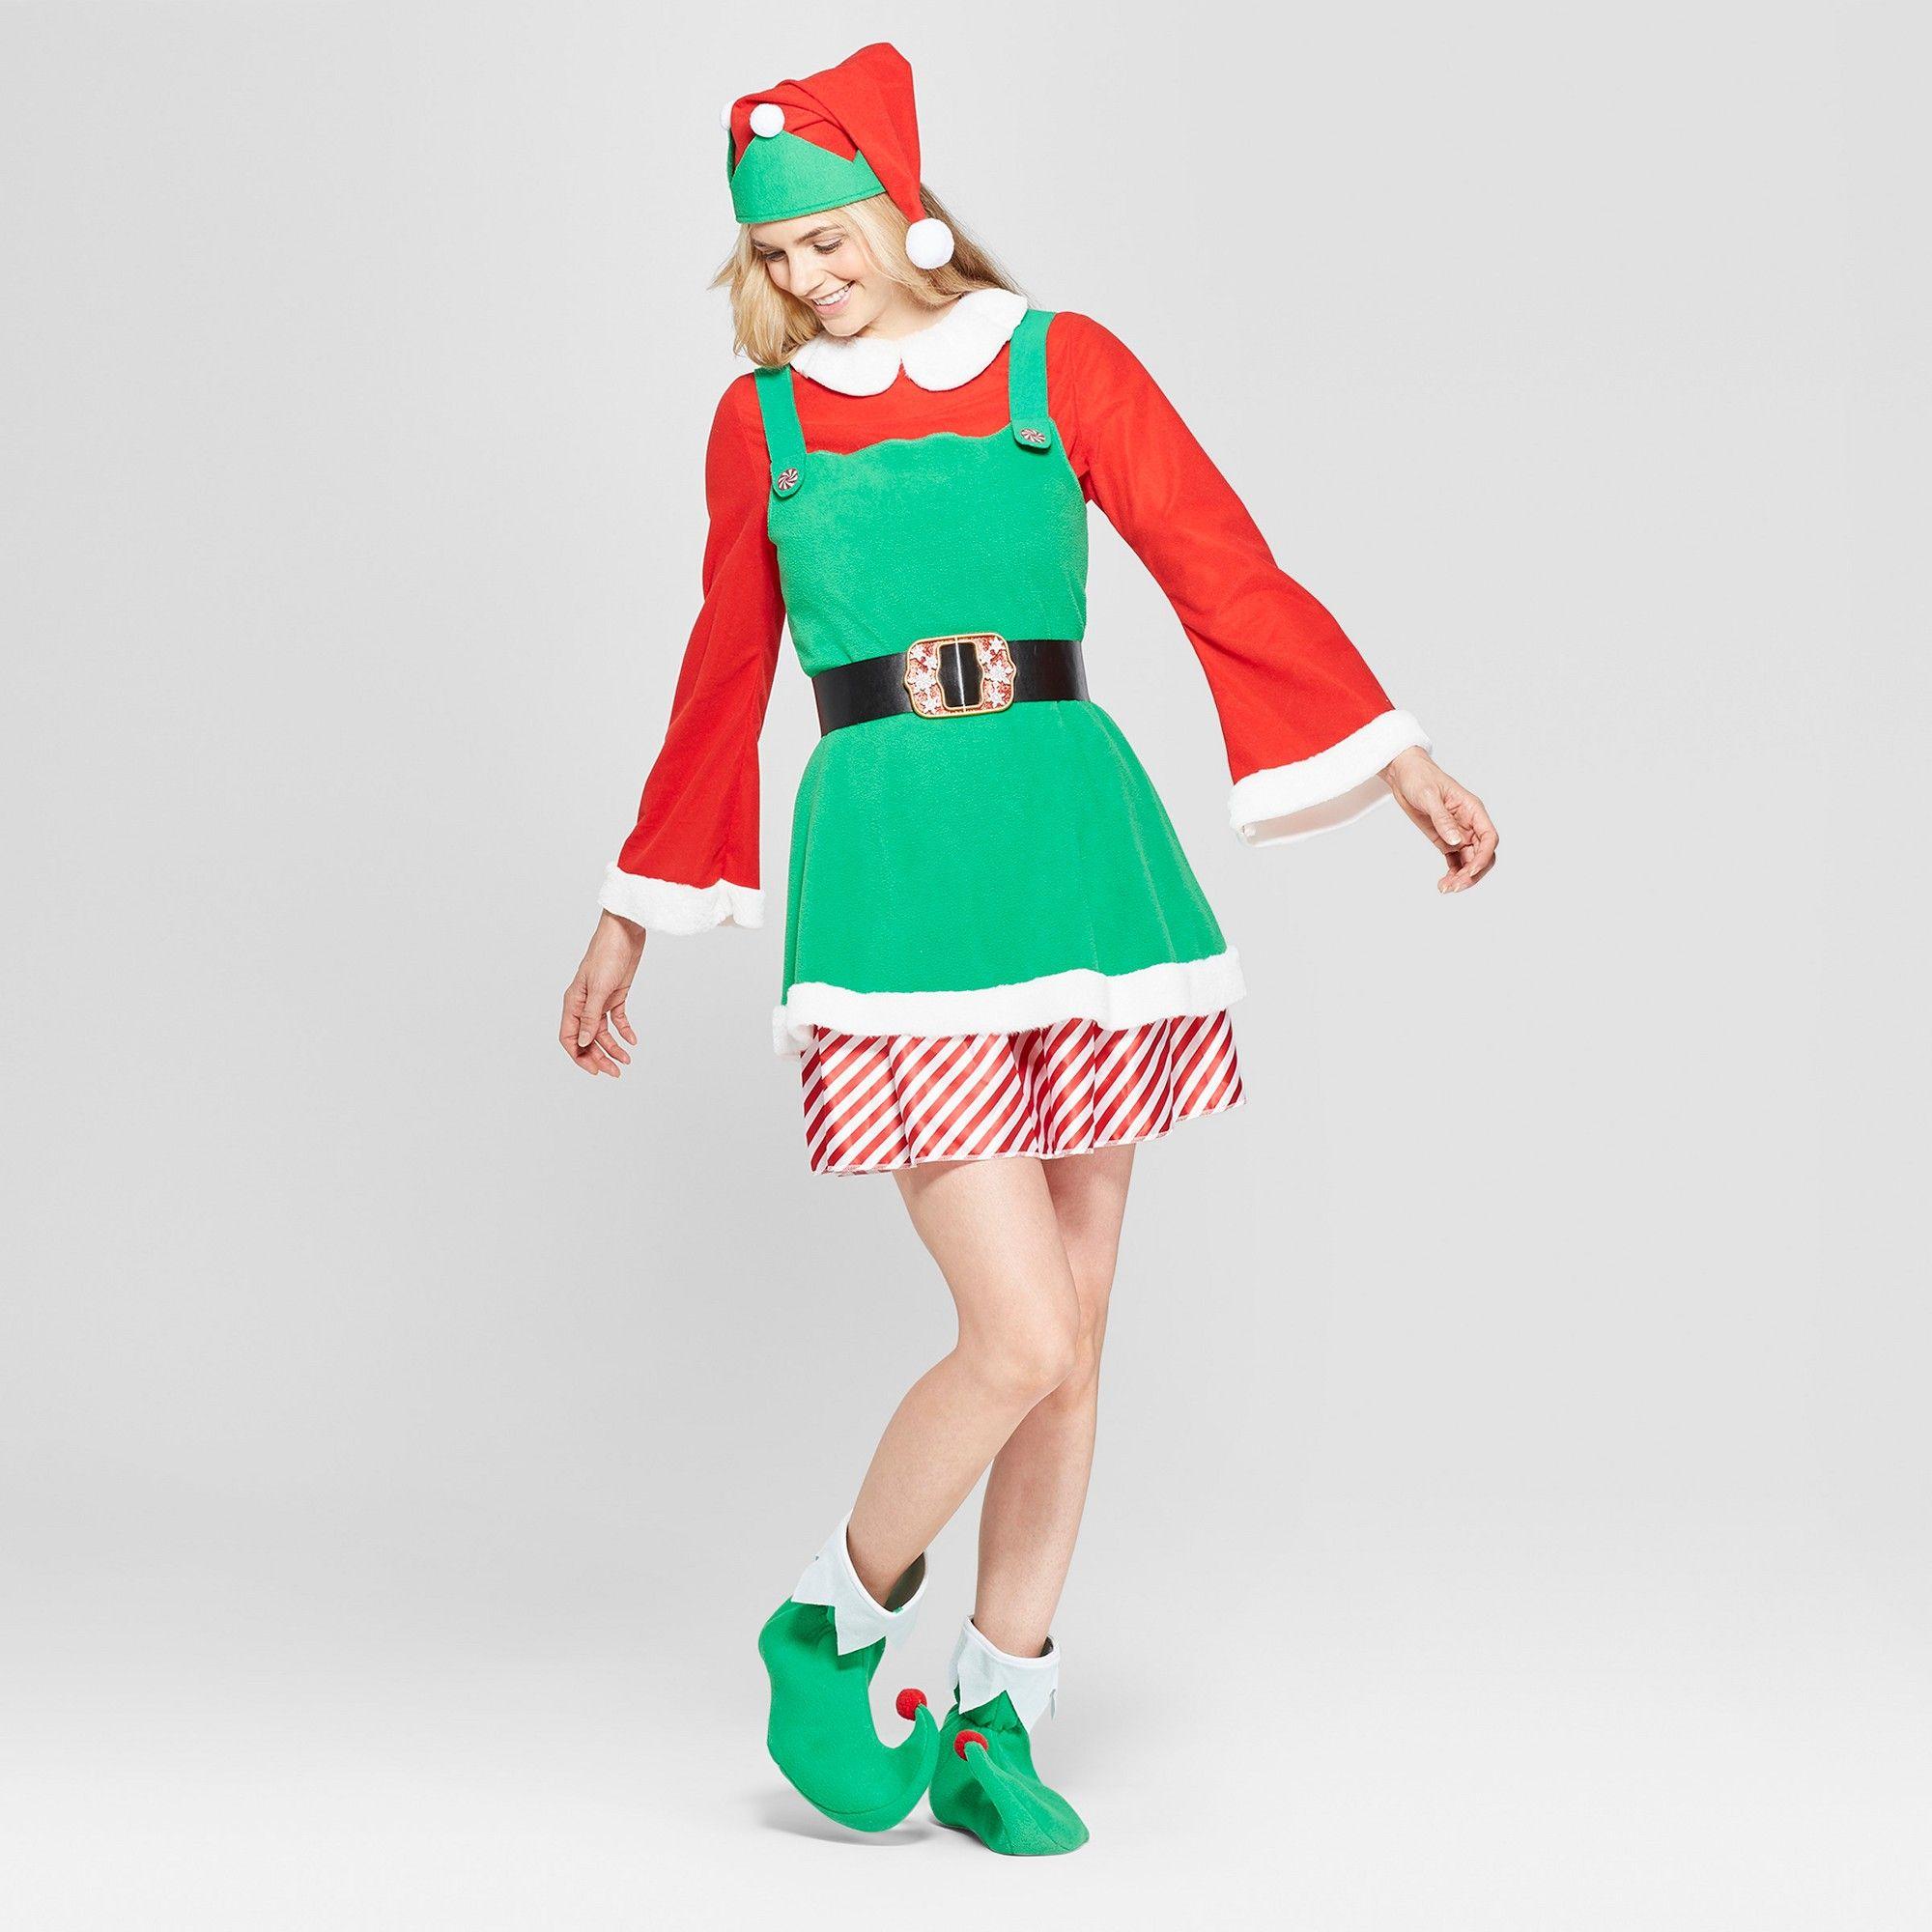 3da30eb2bf0 Halloween Women s Elf Costume M - Wondershop